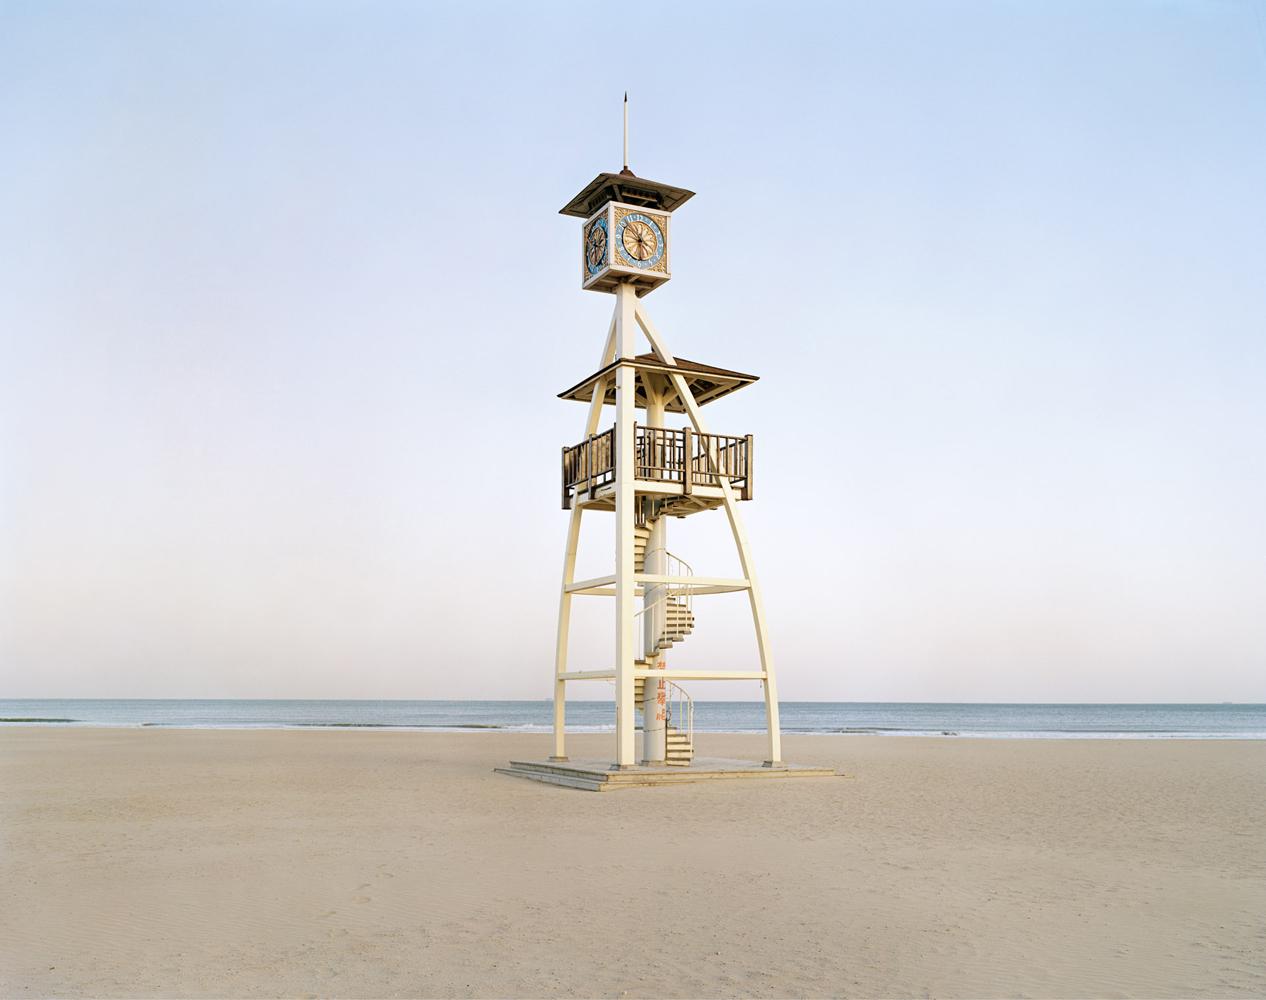 Shilaoren Bathing Beach ,   Qingdao 2014 Archival Print su carta cotone cm 110 x 140 (60x80) ed 5